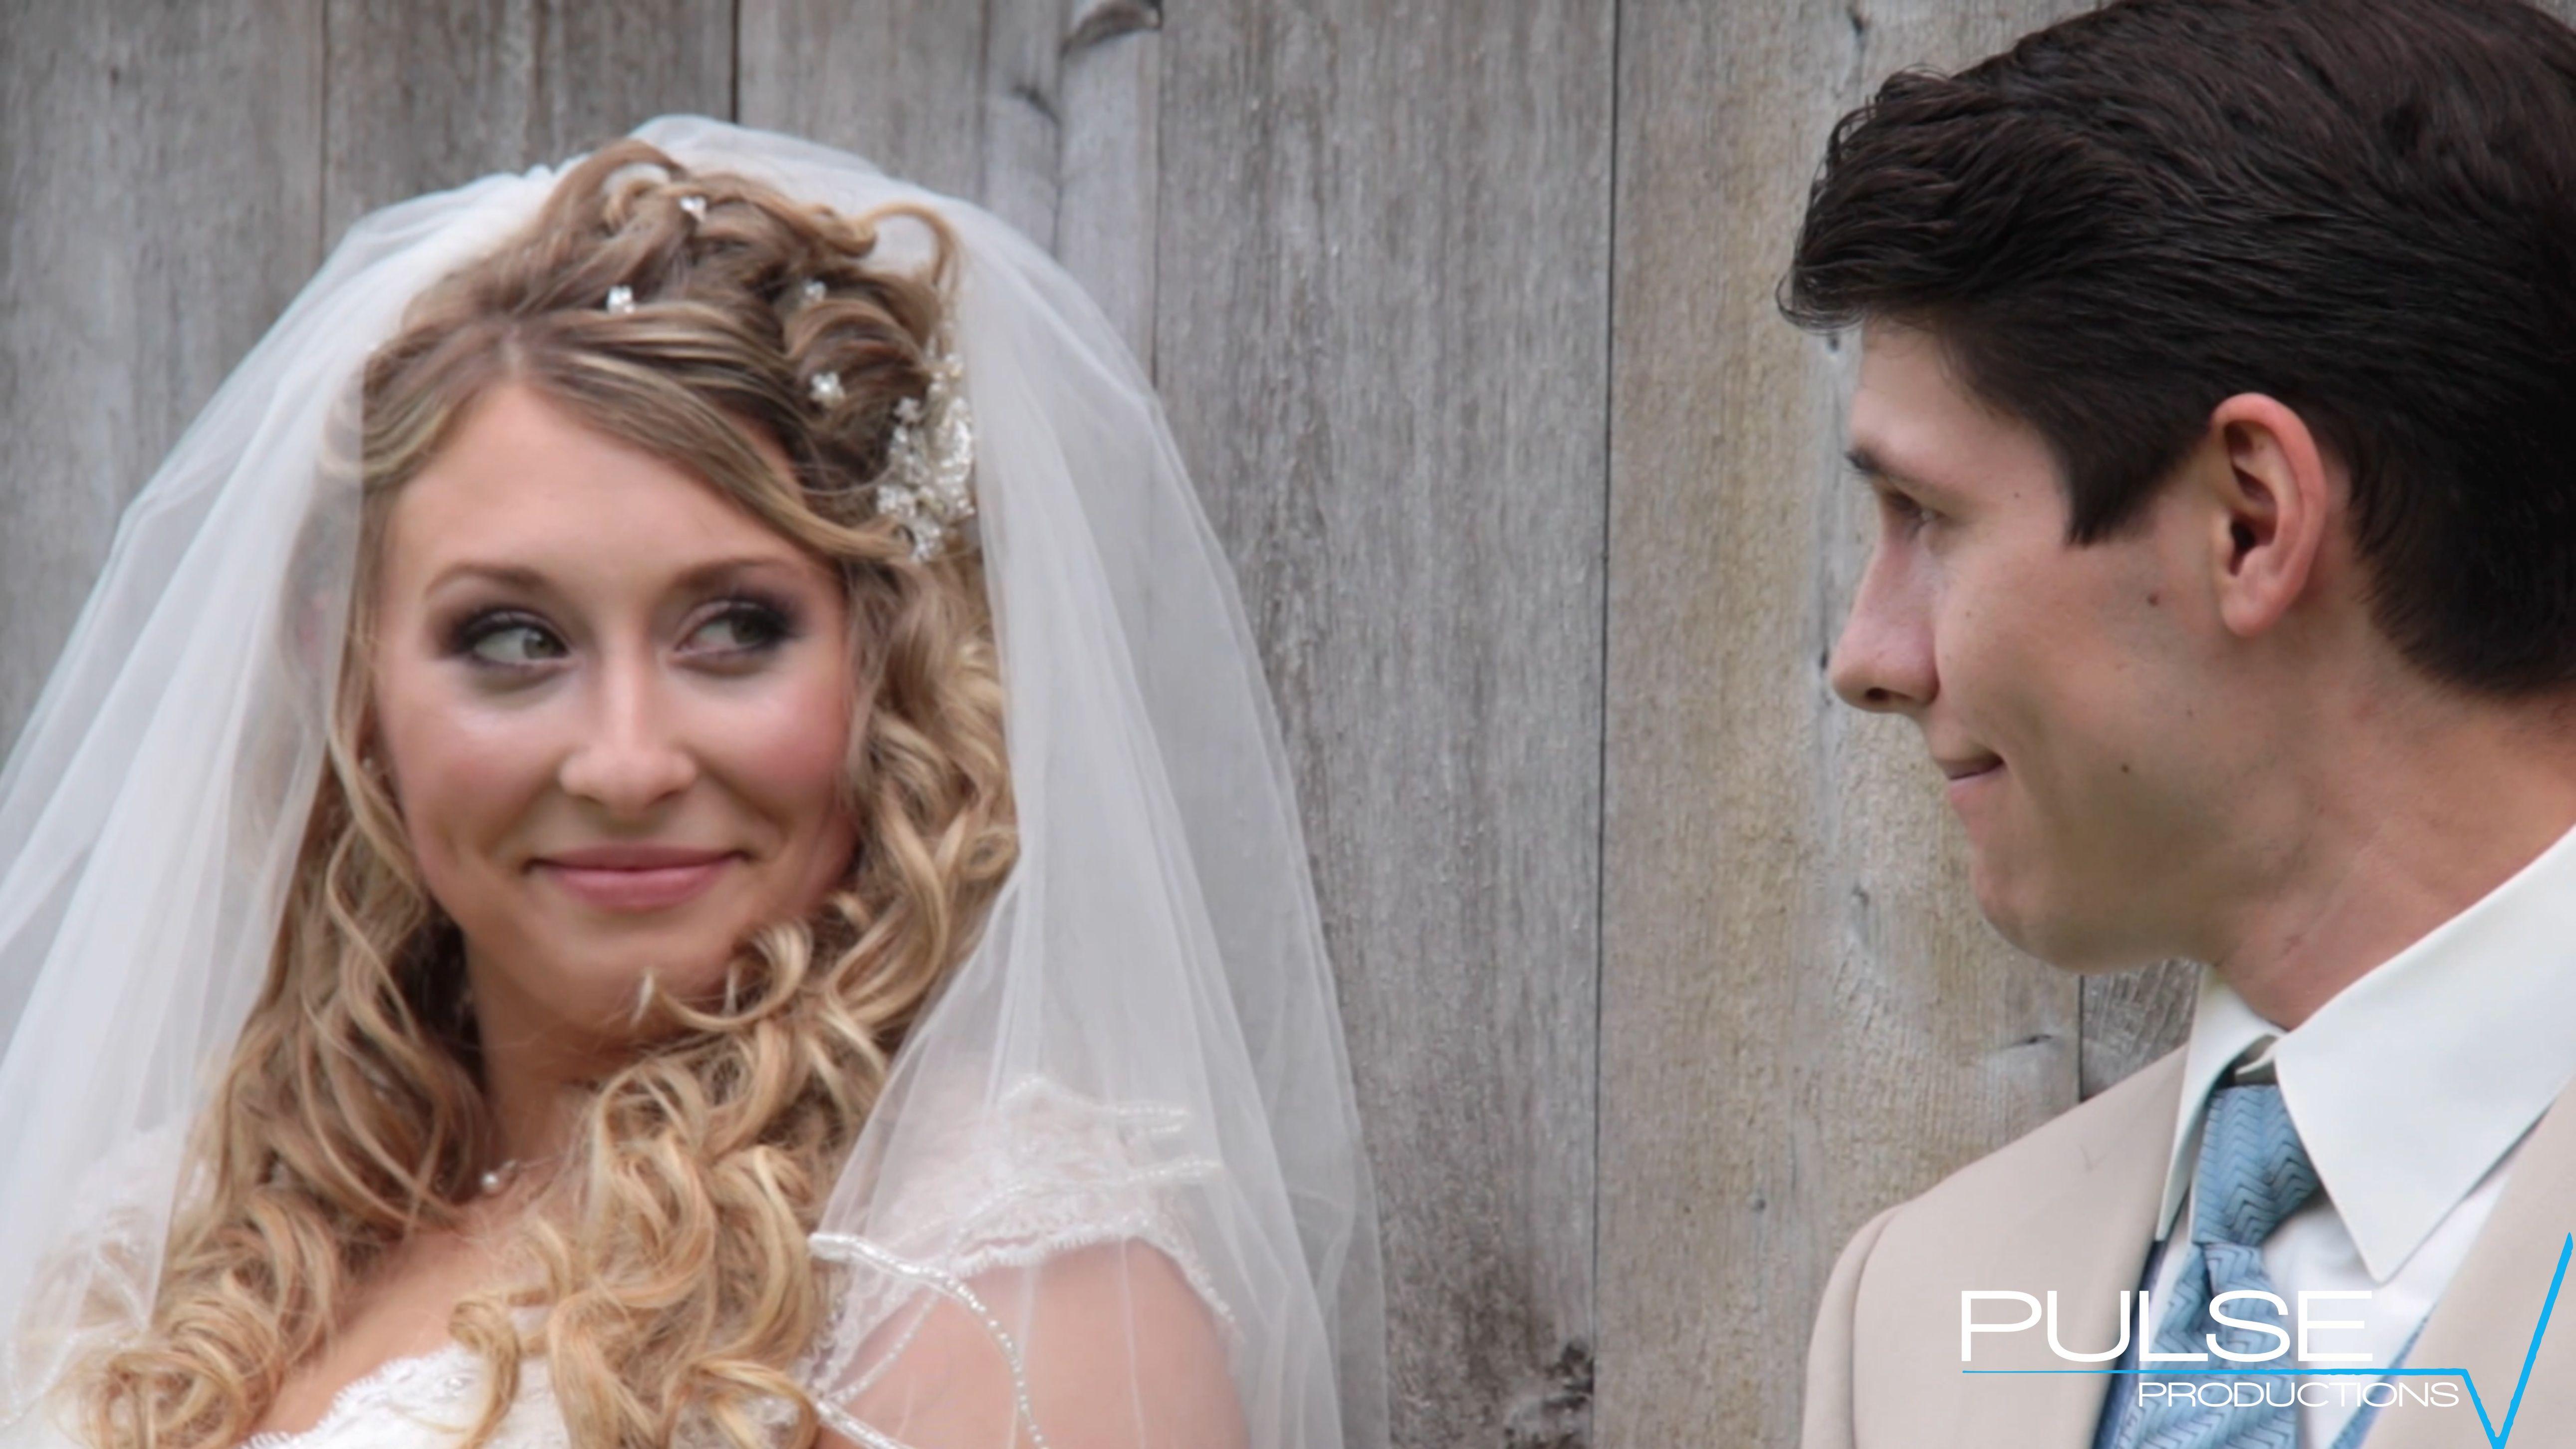 Alex And Orest Wedding Www Pulsecda Com Weddings Wedding Videos Wedding Video Wedding Videography